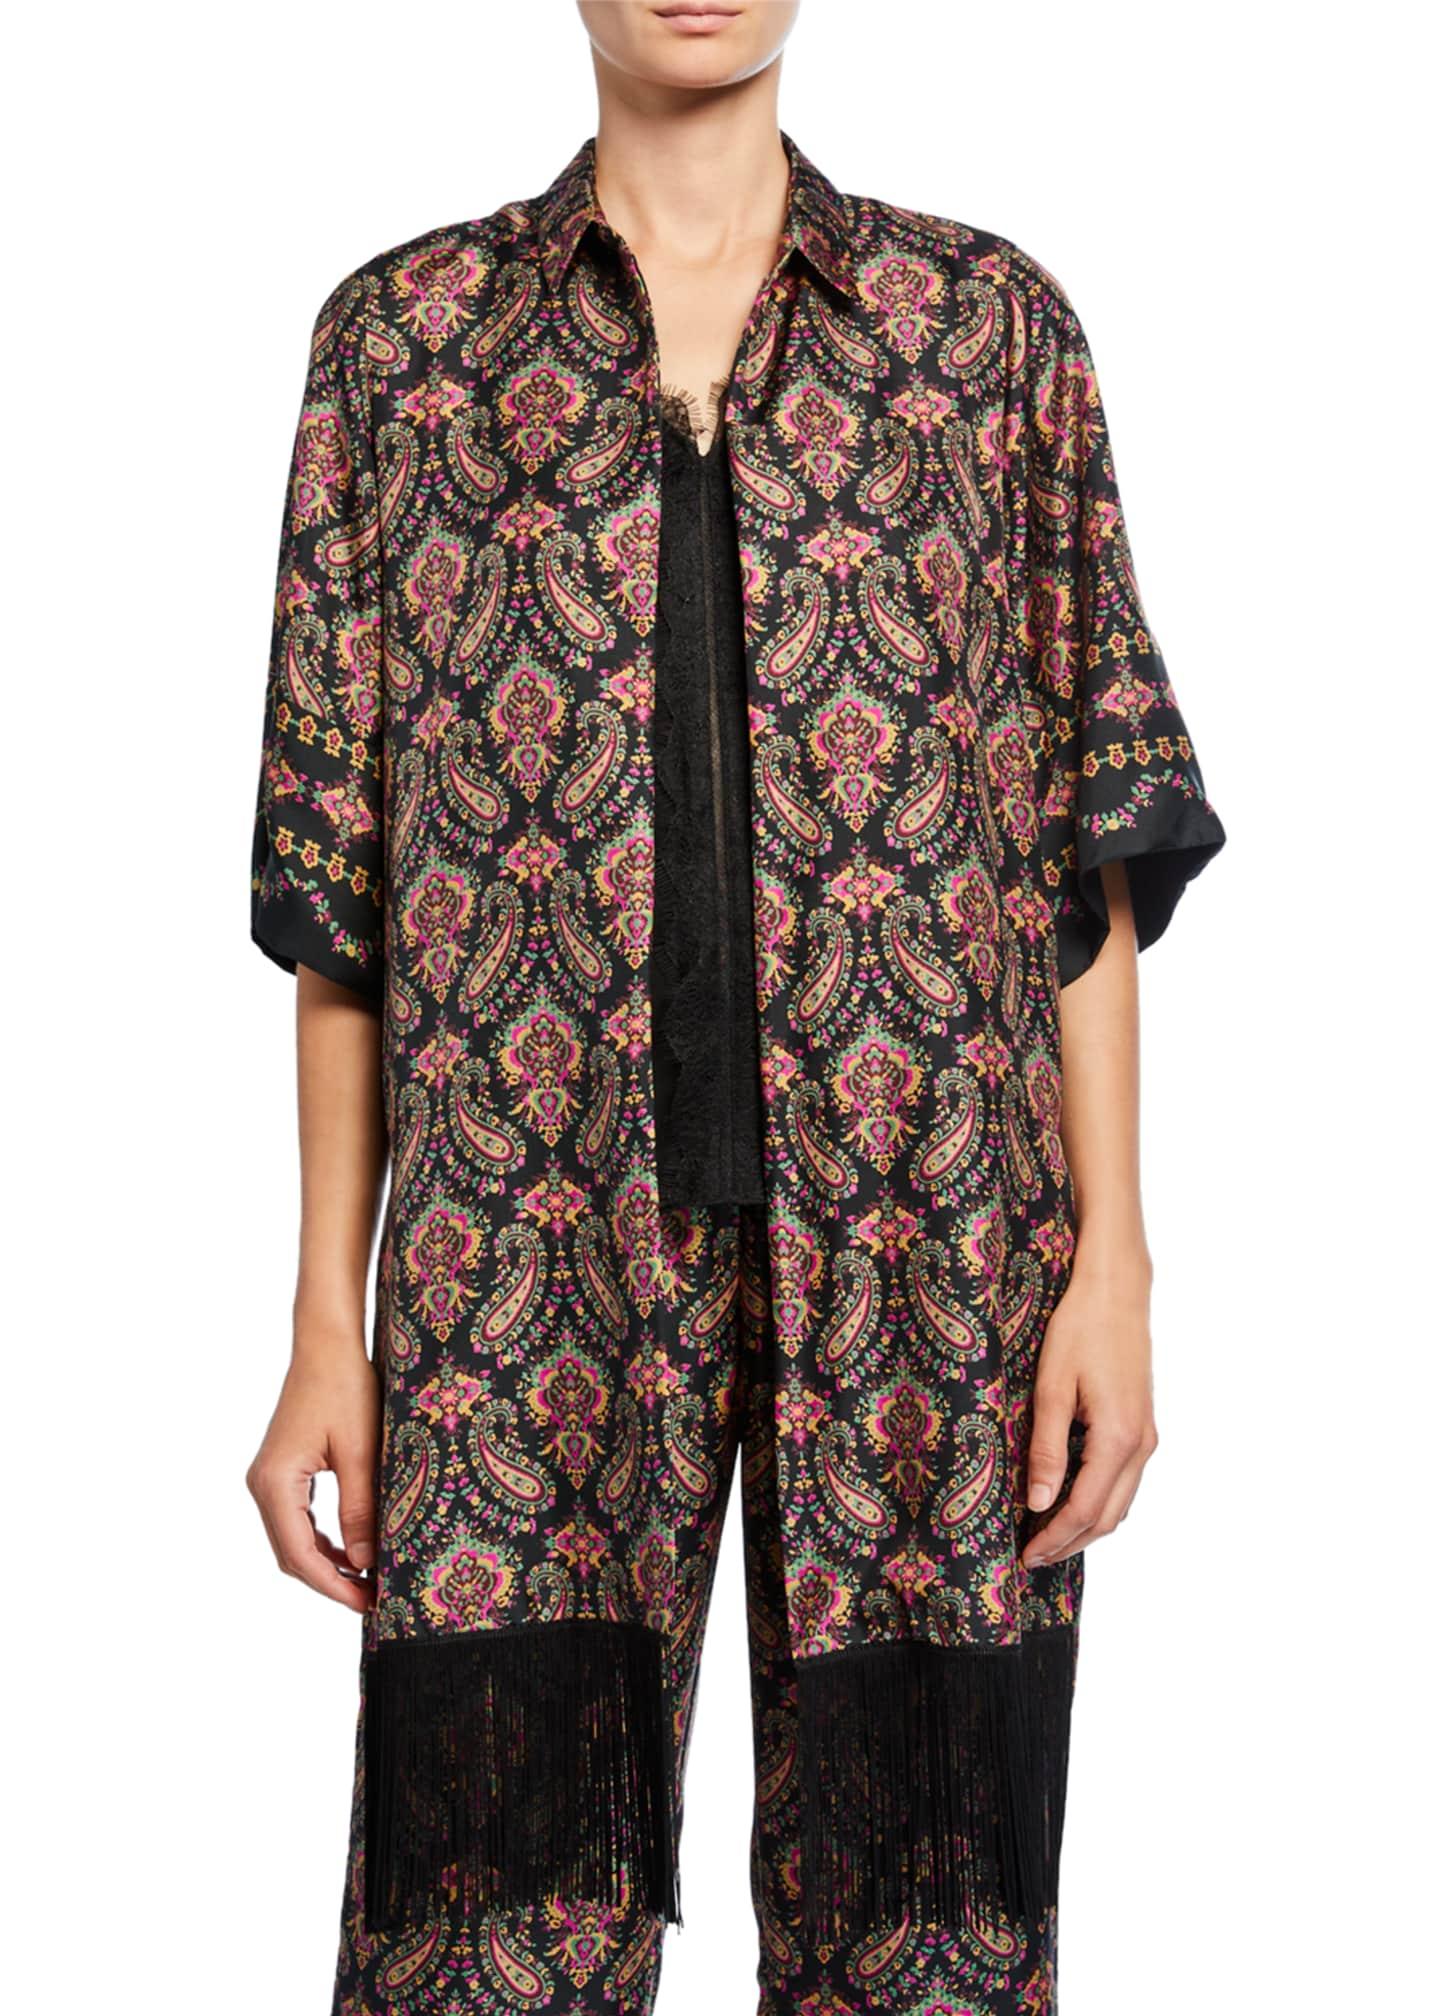 Kobi Halperin Jaycee Paisley Silk Shirt Jacket with